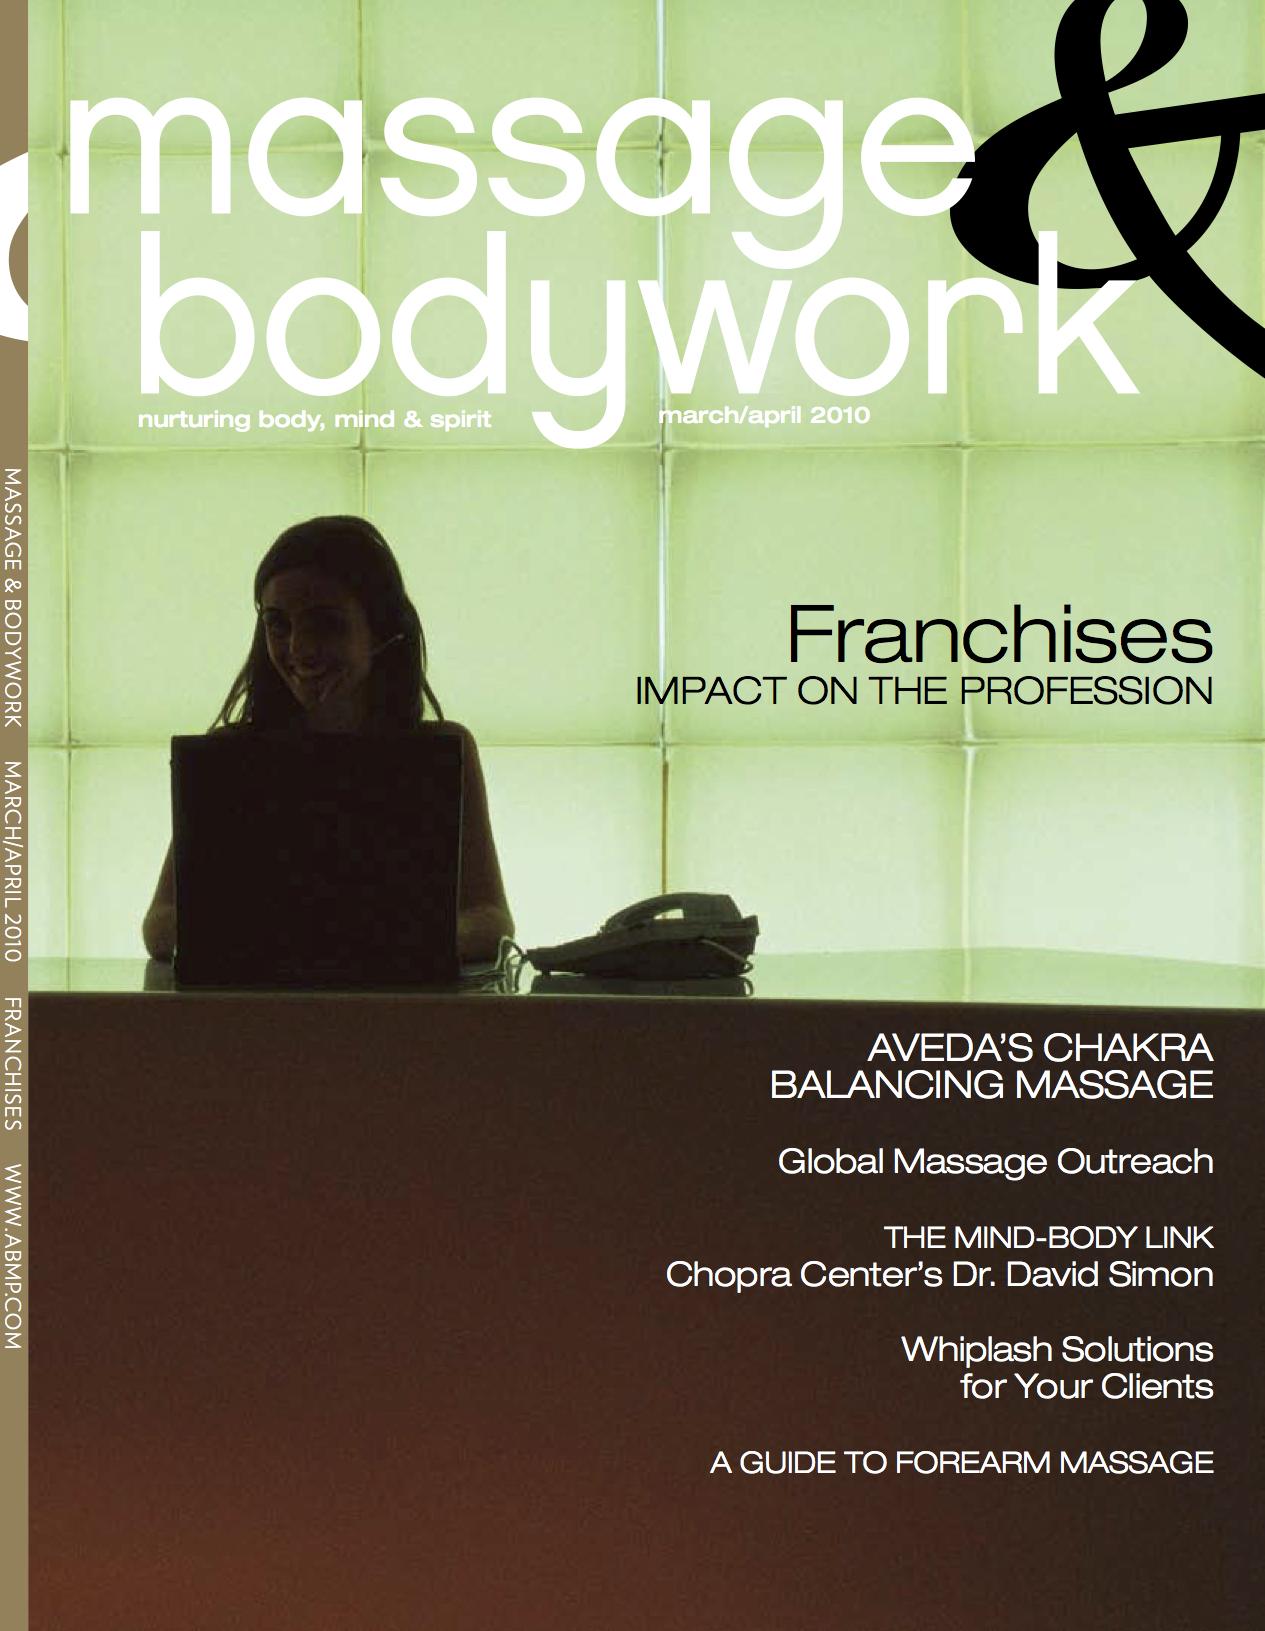 Massage & Bodywork- March / April 2010